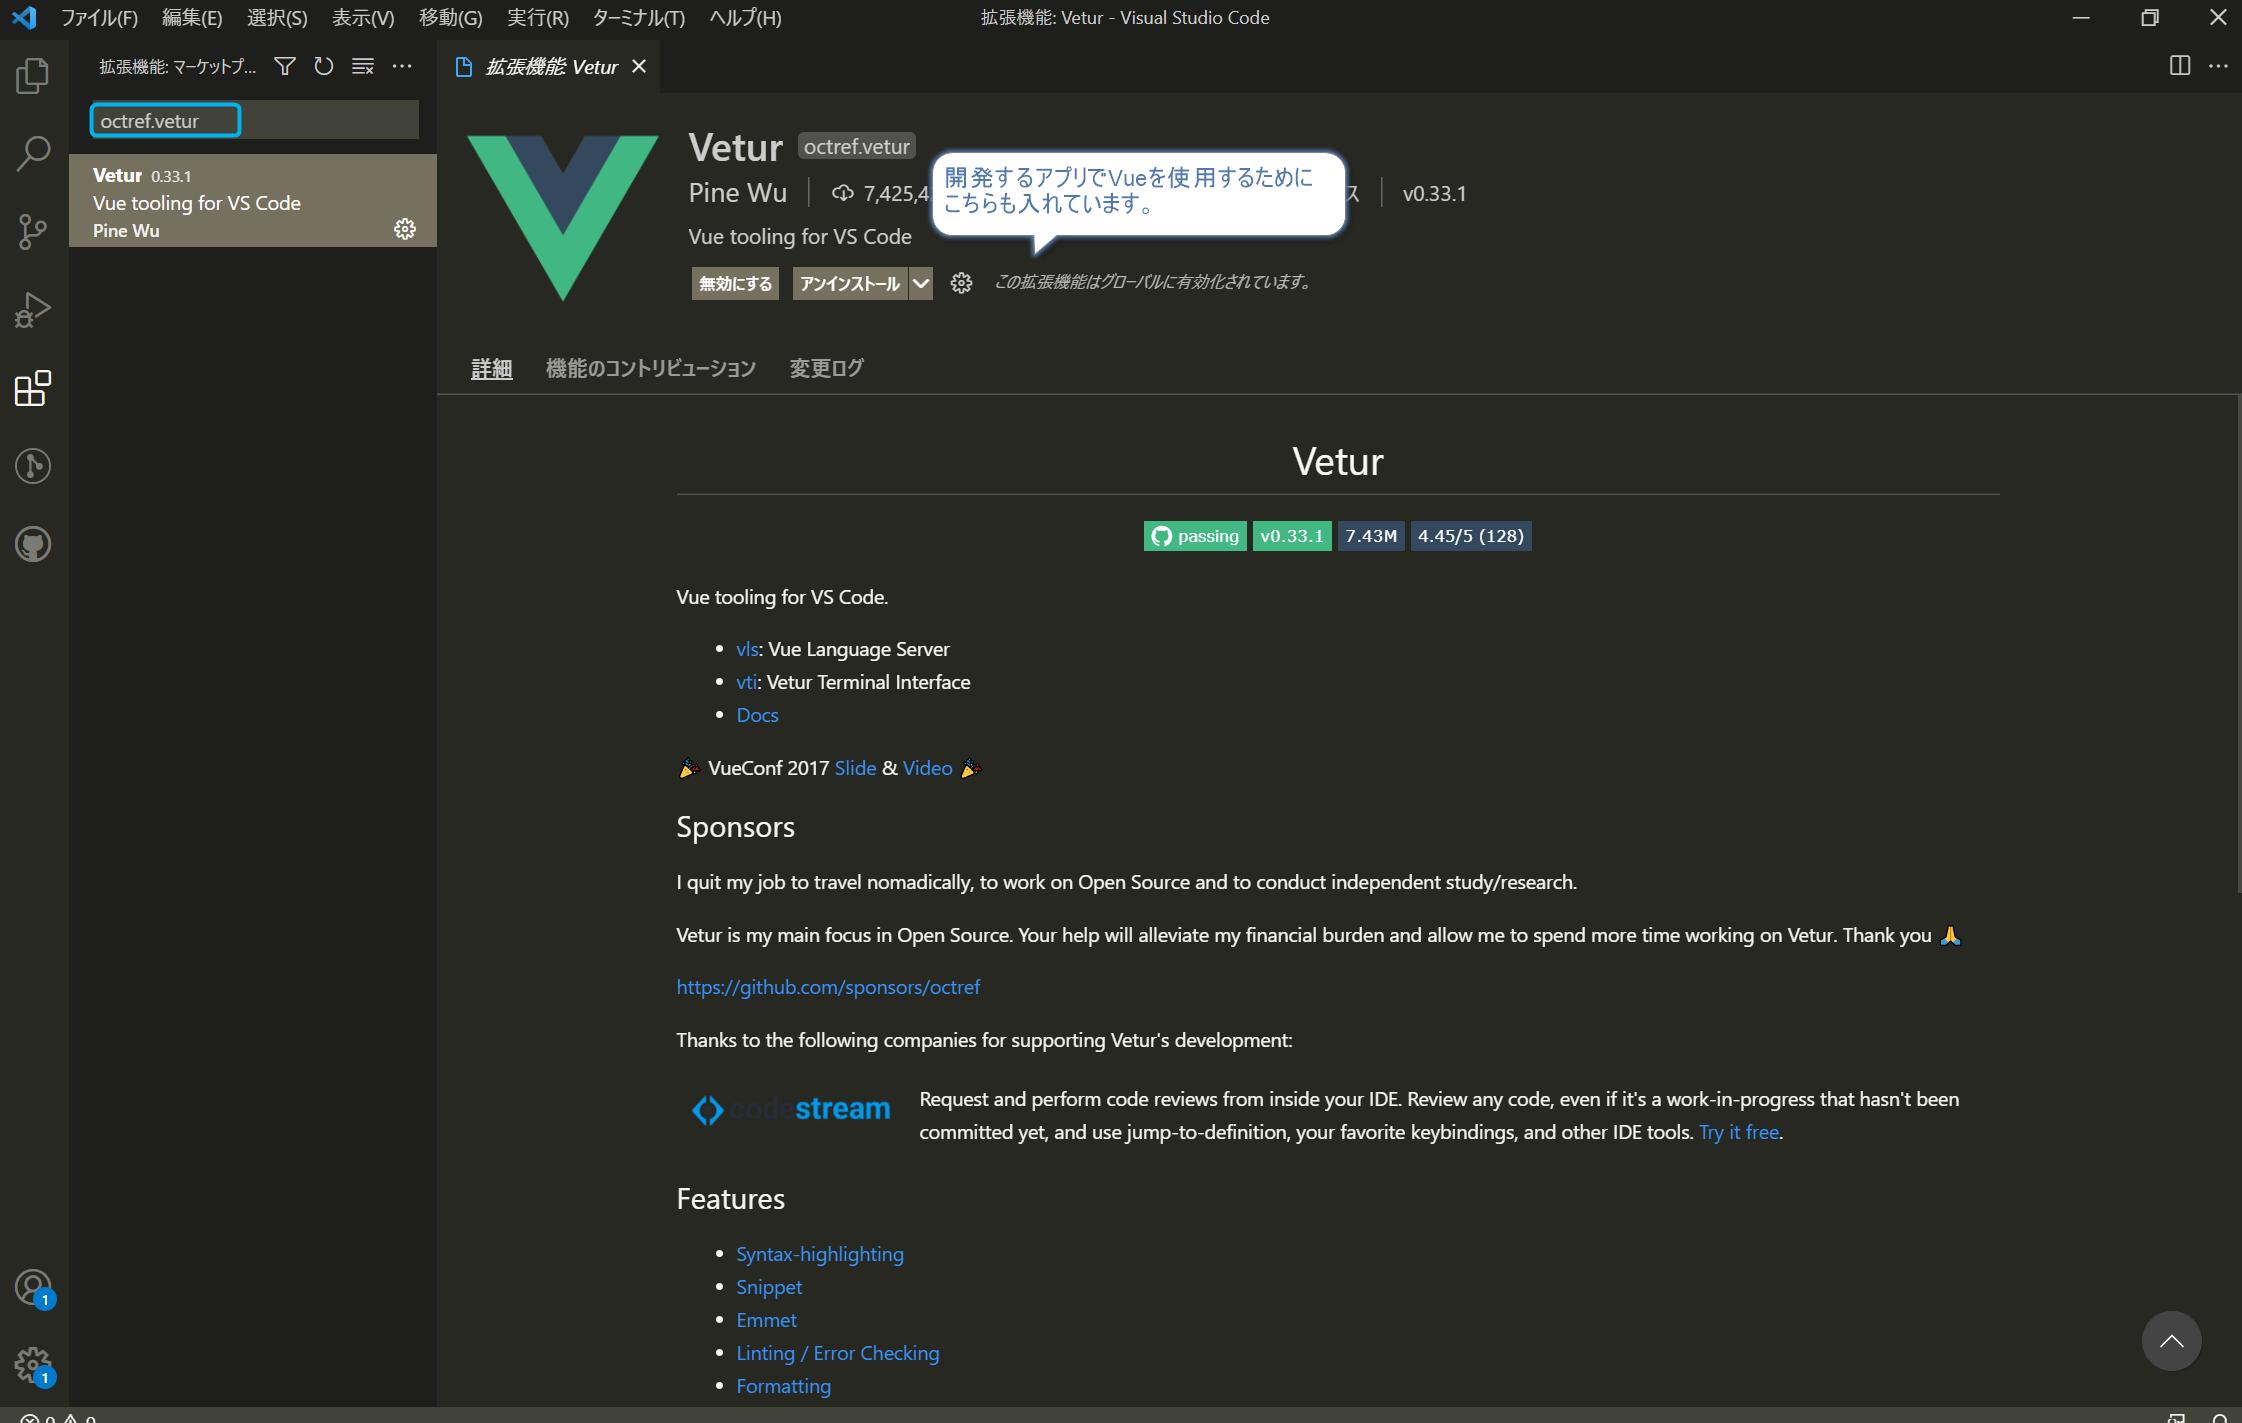 JavaSpring_vscode_05